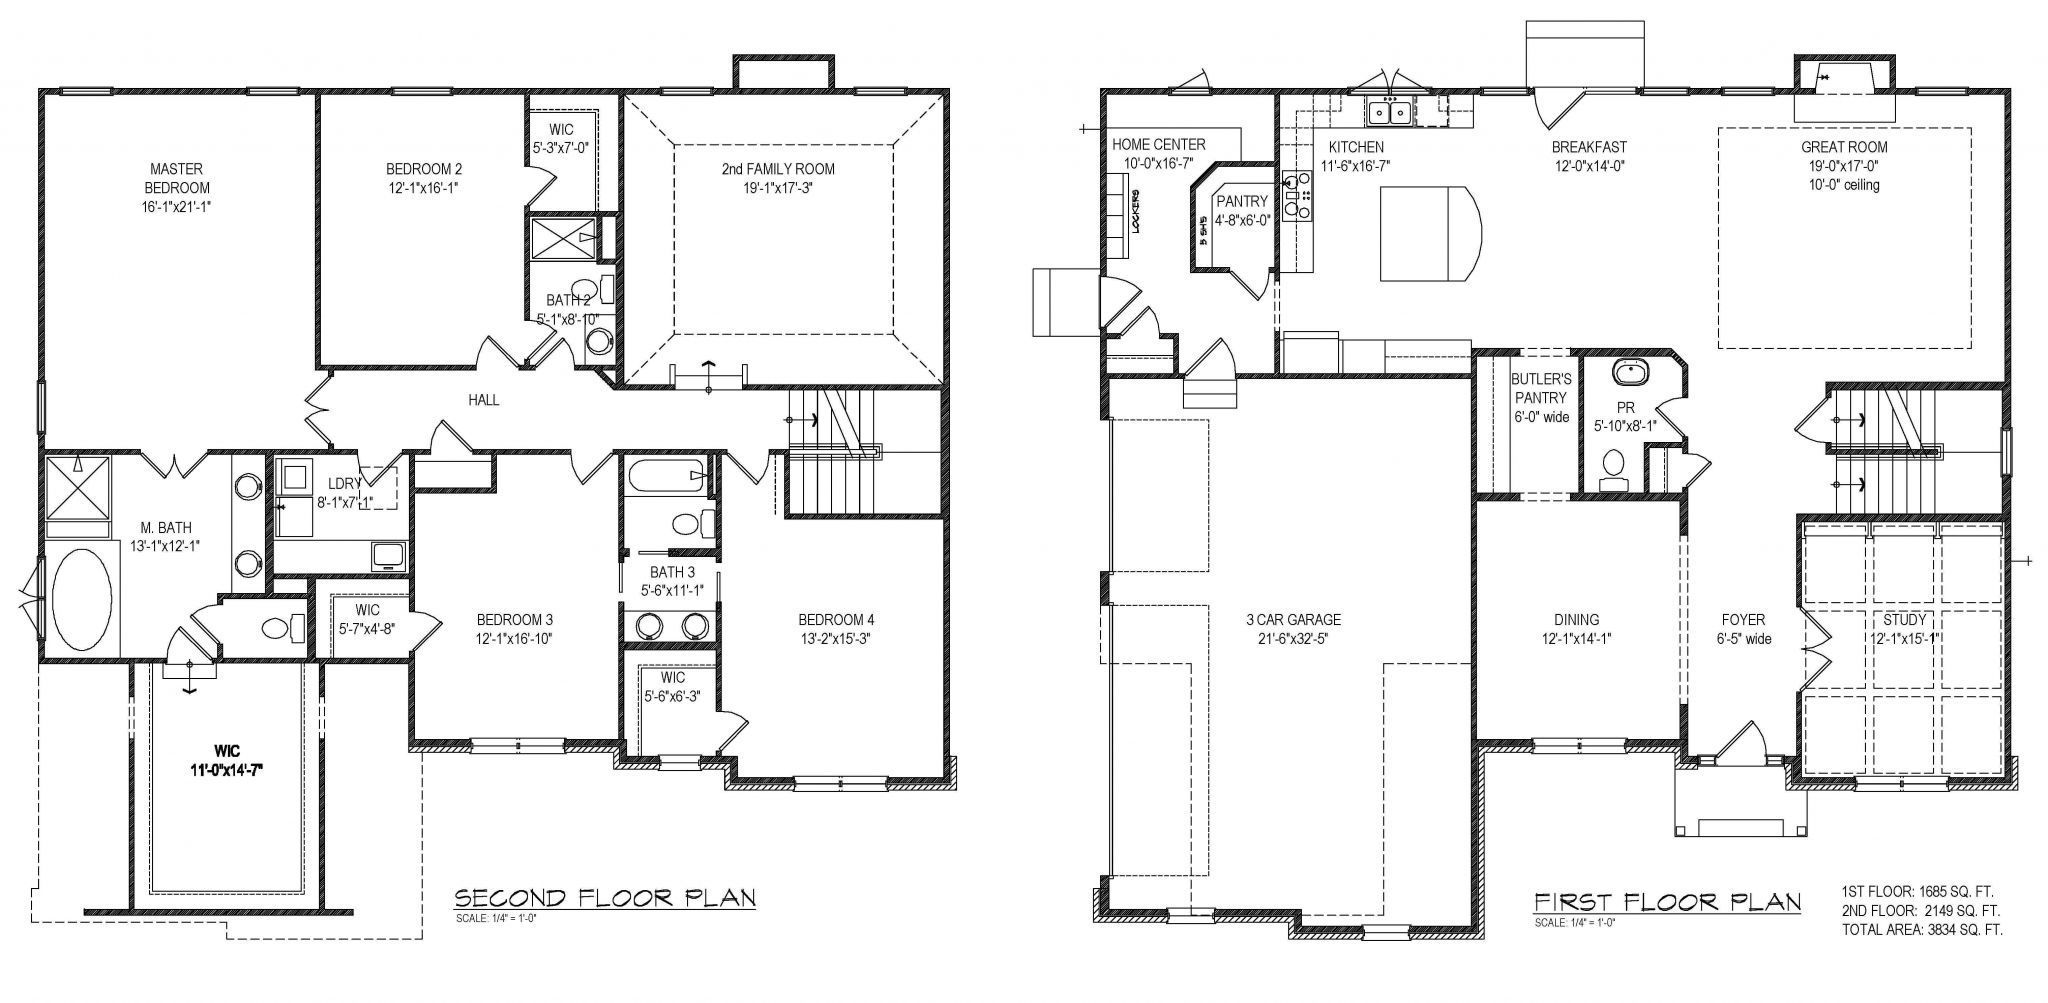 Interior Design Floor Plan Sketches Architectural Custom House